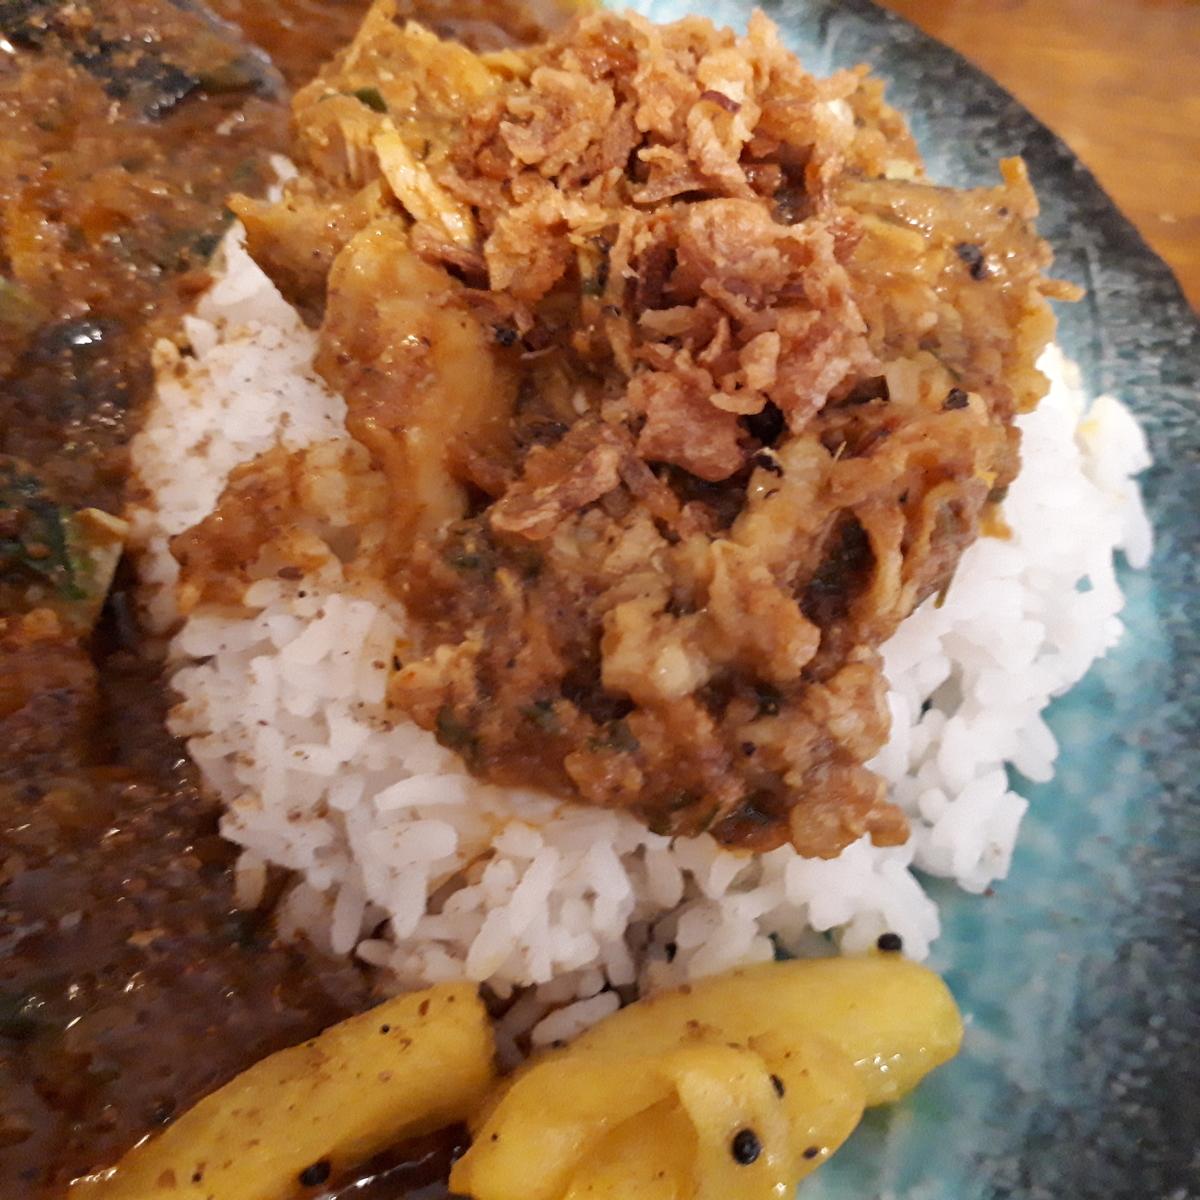 wacca 2019年8月3日 鶏と鰹の出汁カレーとパキスタン式無水チキンのダブルチキンカレー  無水チキンカレー